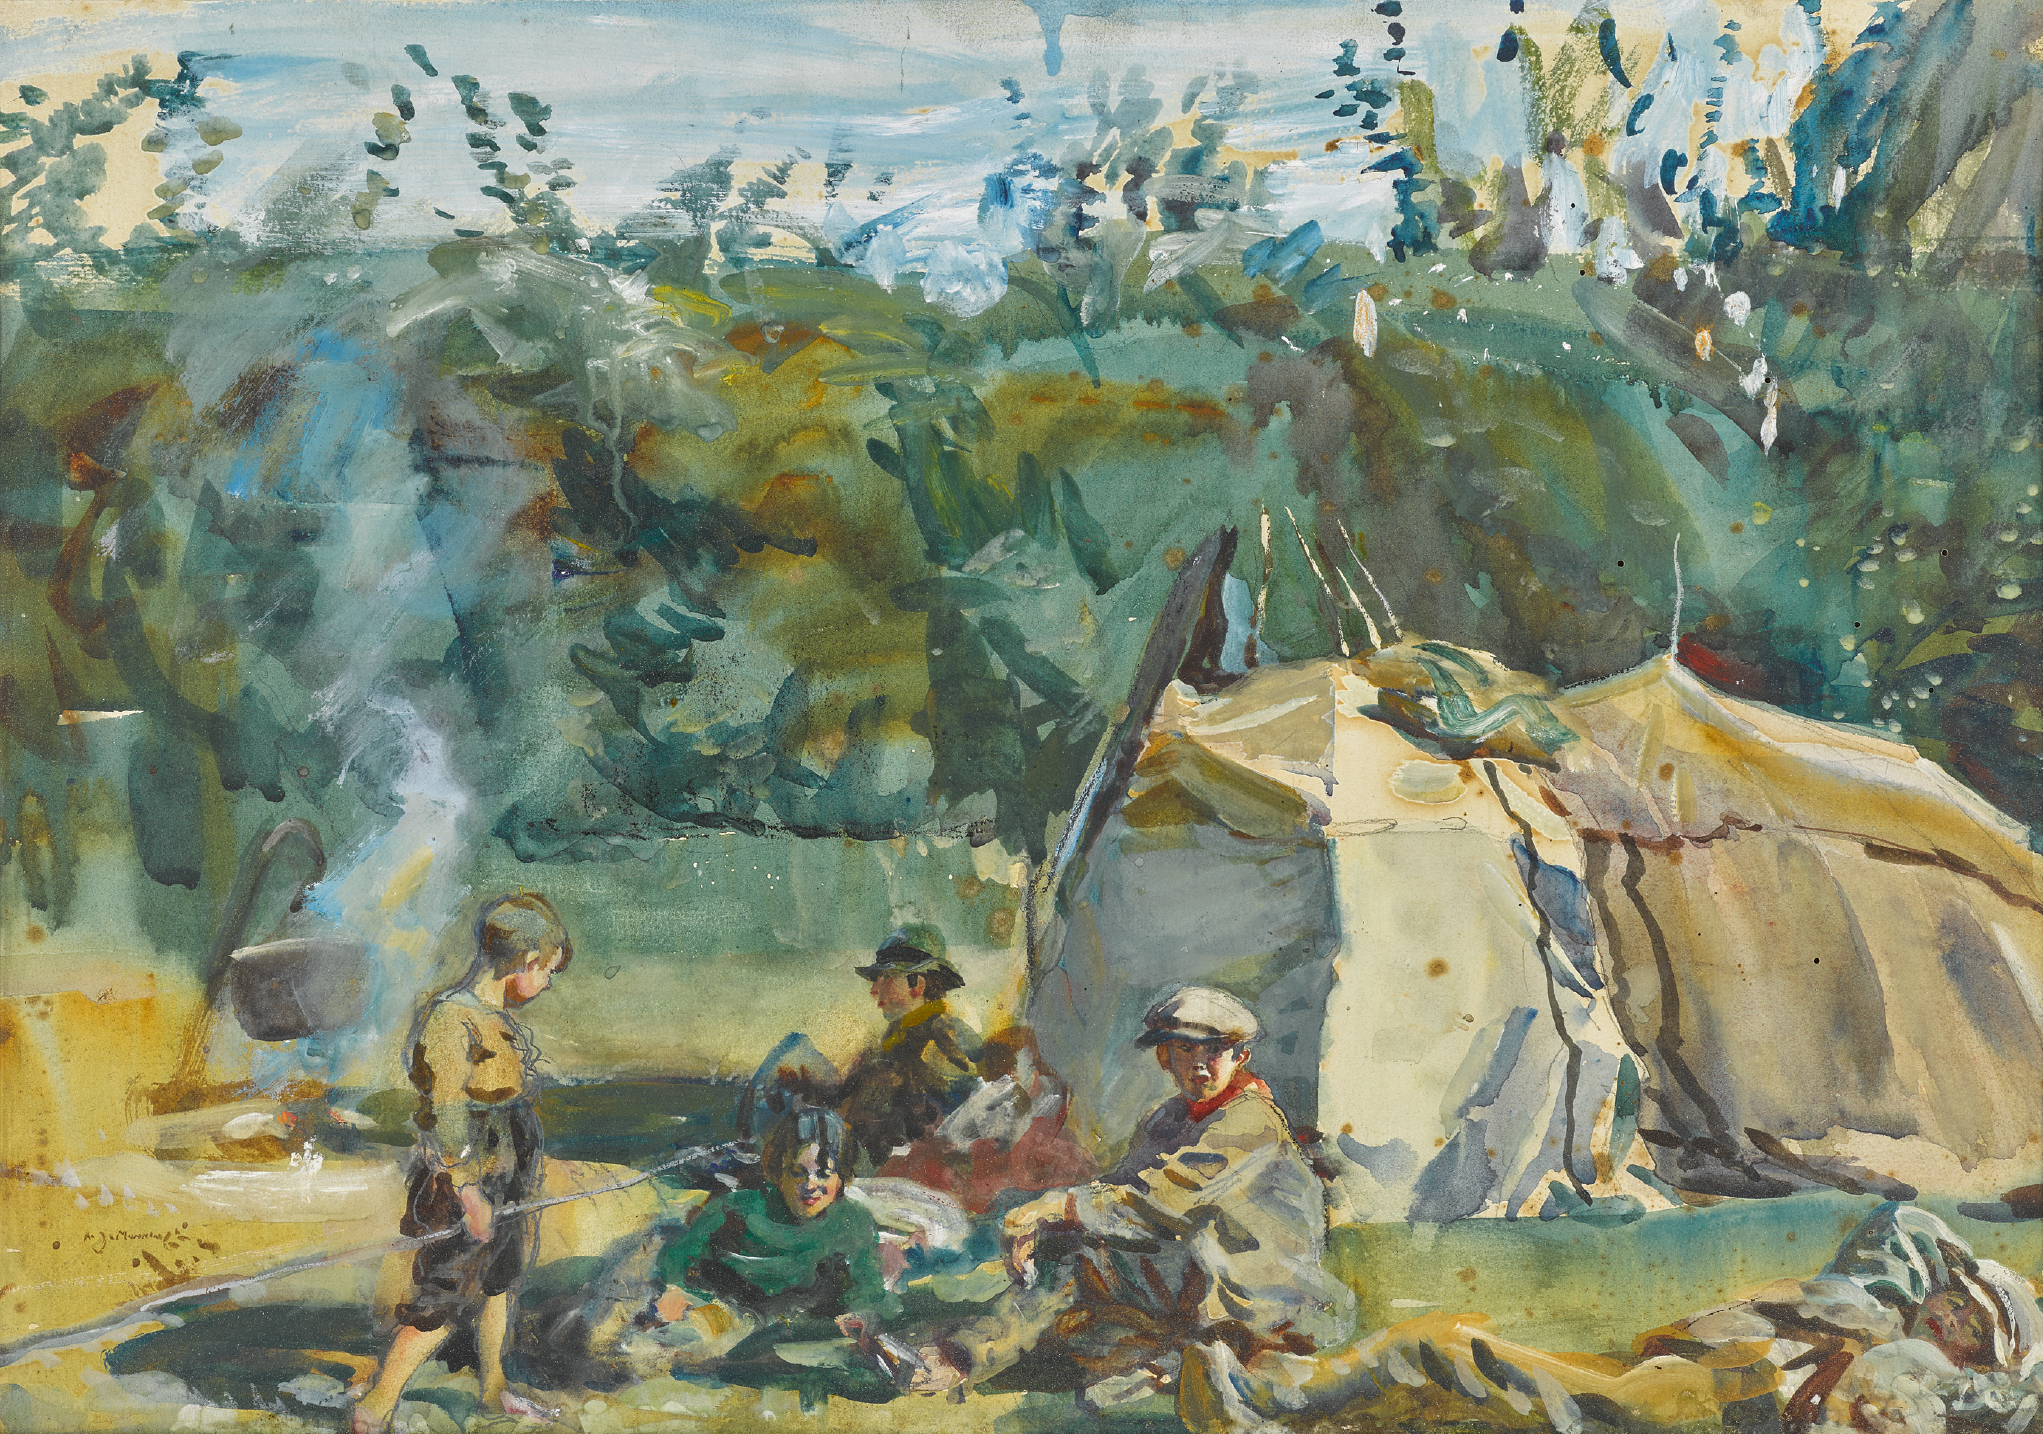 SIR ALFRED JAMES MUNNINGS, P.R.A., R.W.S. | The Gypsy Encampment